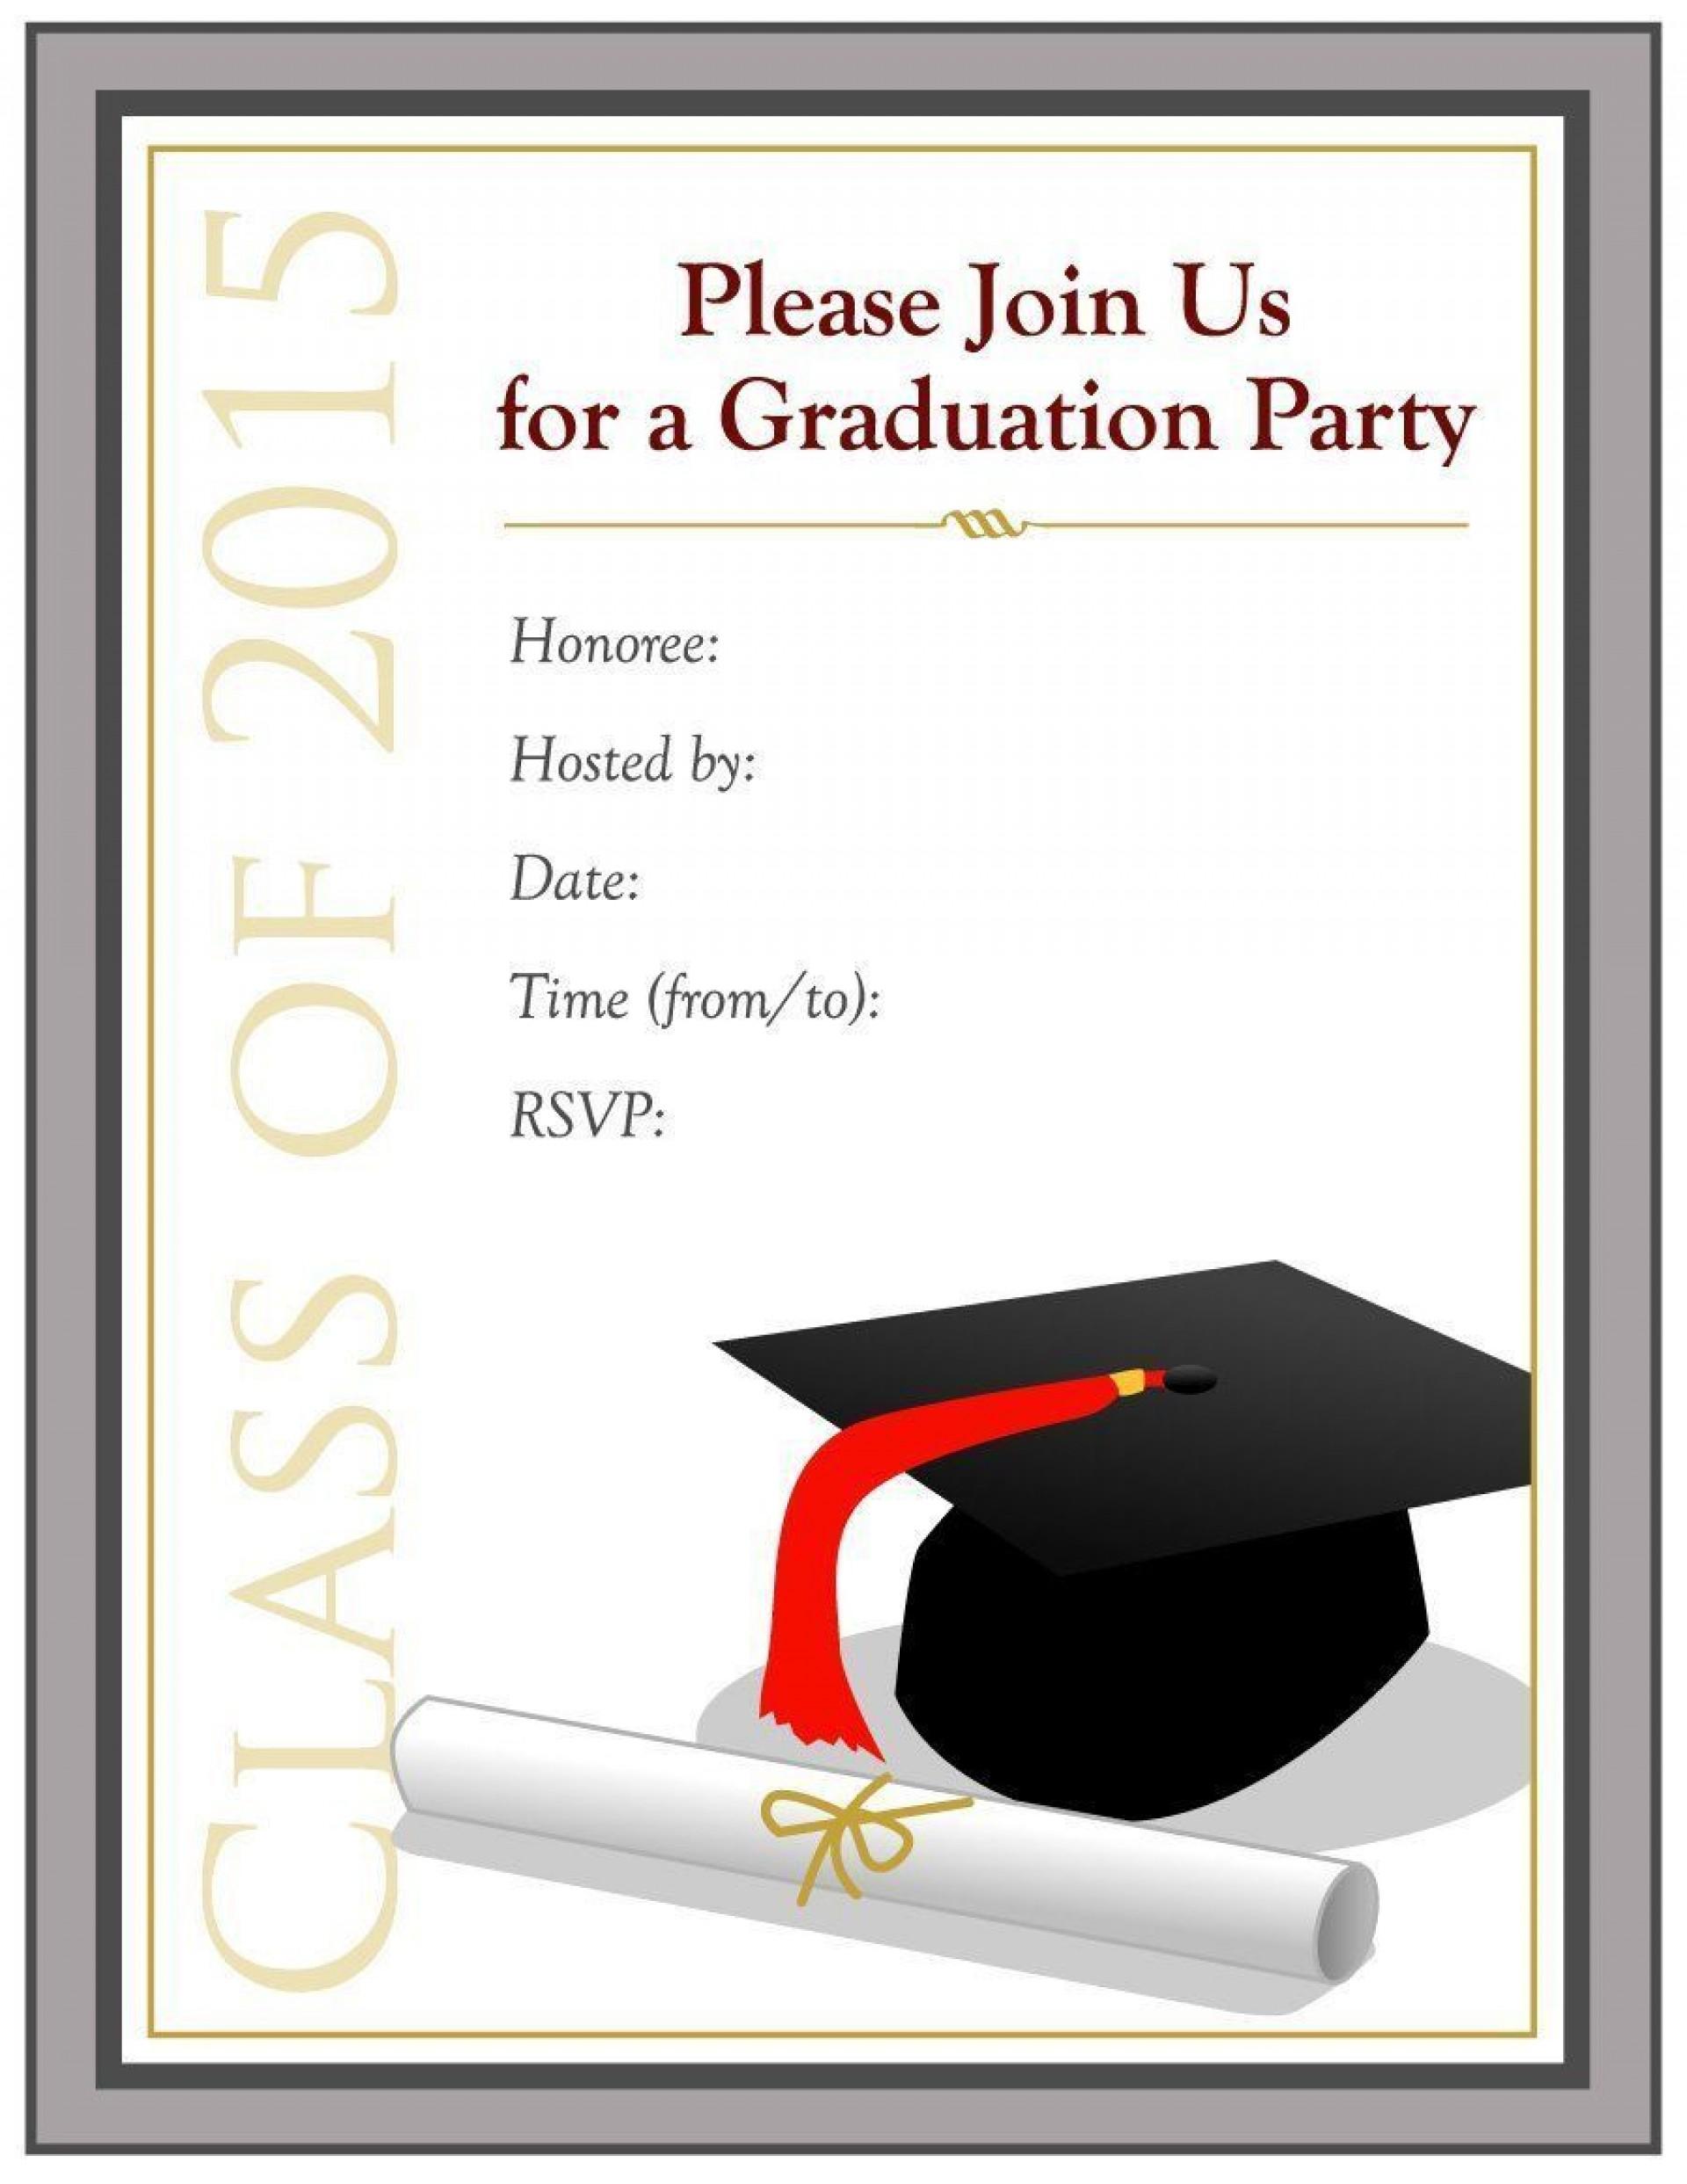 000 Awful Microsoft Word Graduation Invitation Template Image  Party1920